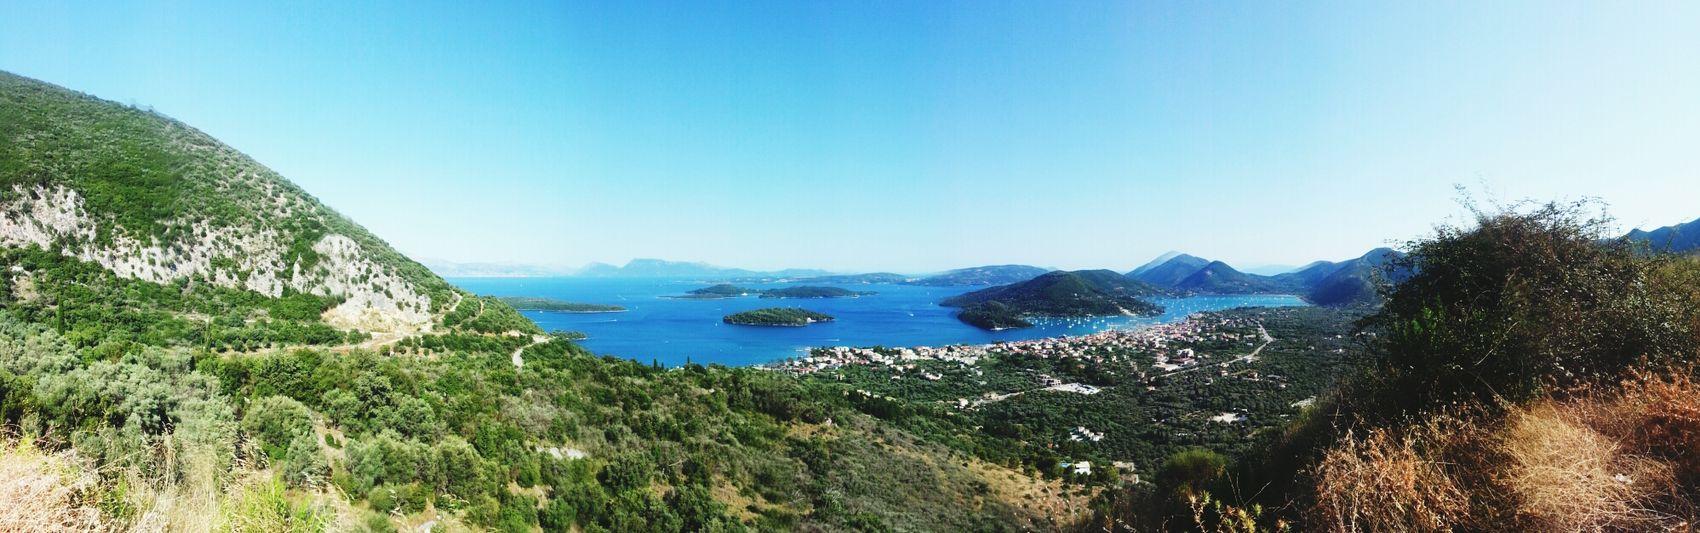 Greece Nature Wiev